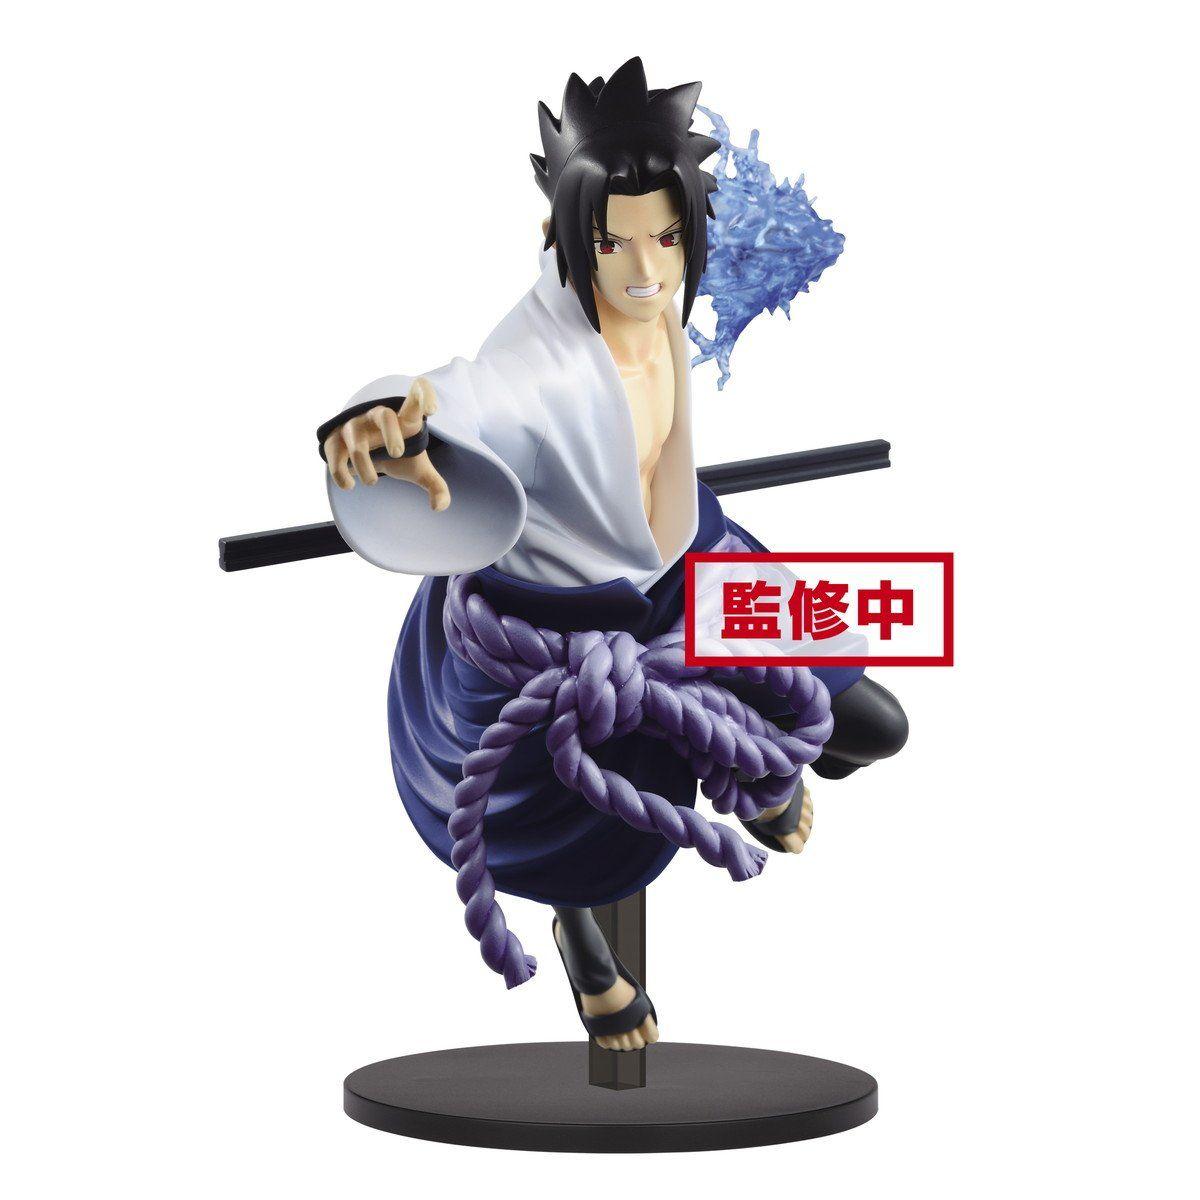 Anime Naruto Akatsuki Uchiha Itachi 32 cm Action Figure Statue Modèle Jouet